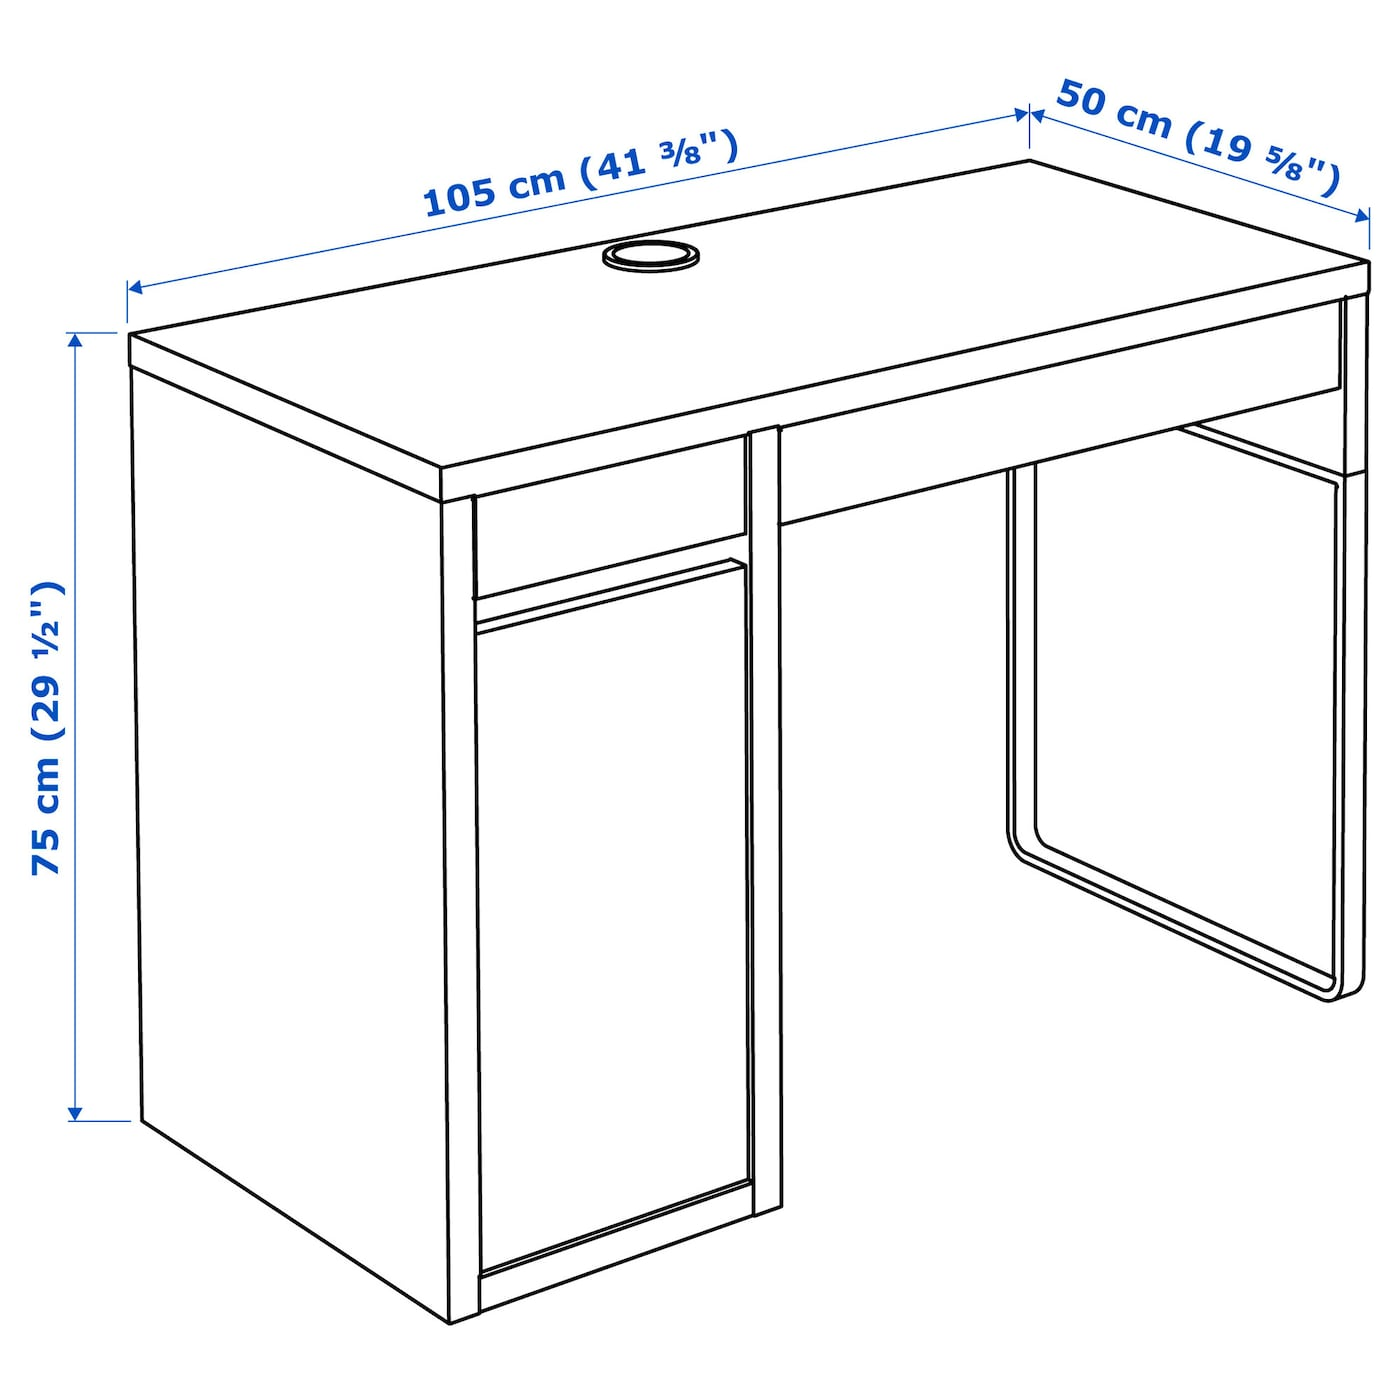 Computer Home Office White Oak Effect & Black/Brown 33x33cm IKEA